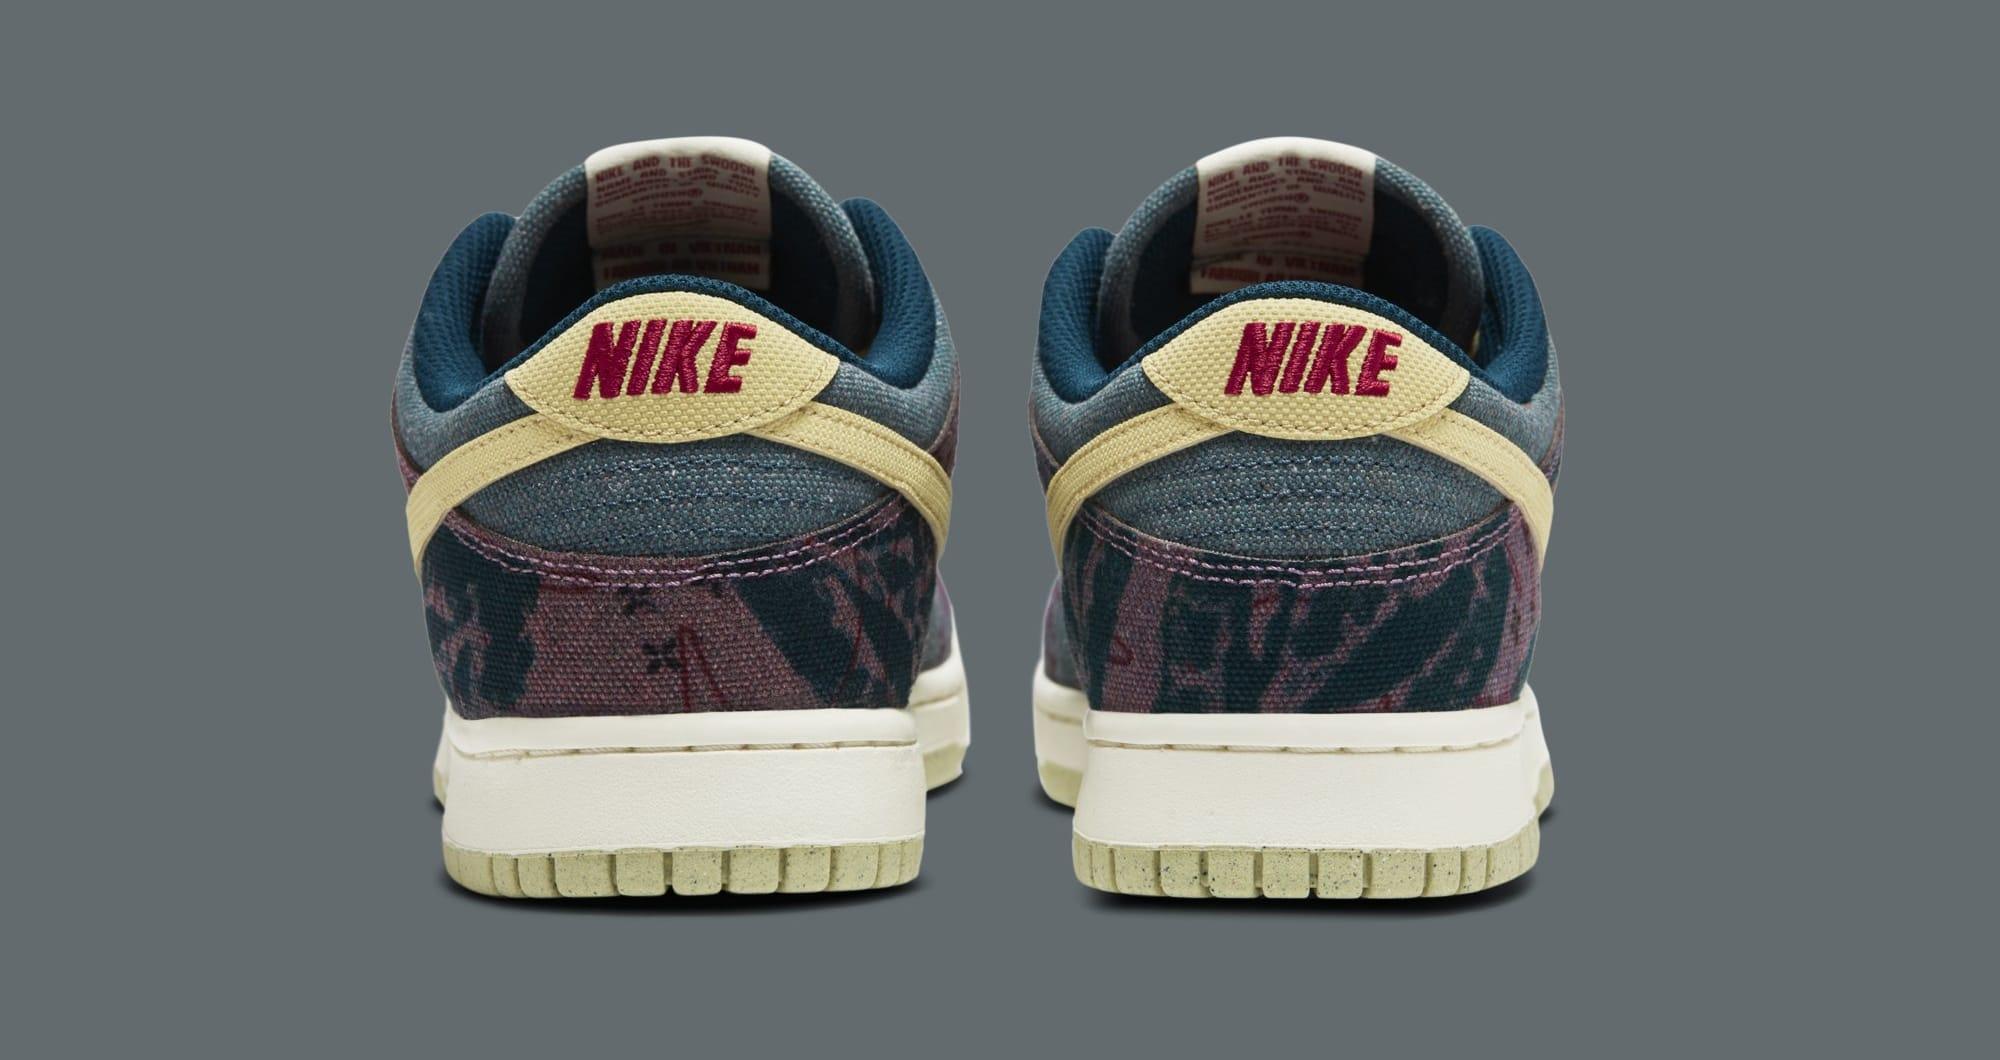 Nike Dunk Low SP 'Lemon Wash' CZ9747-900 Heel